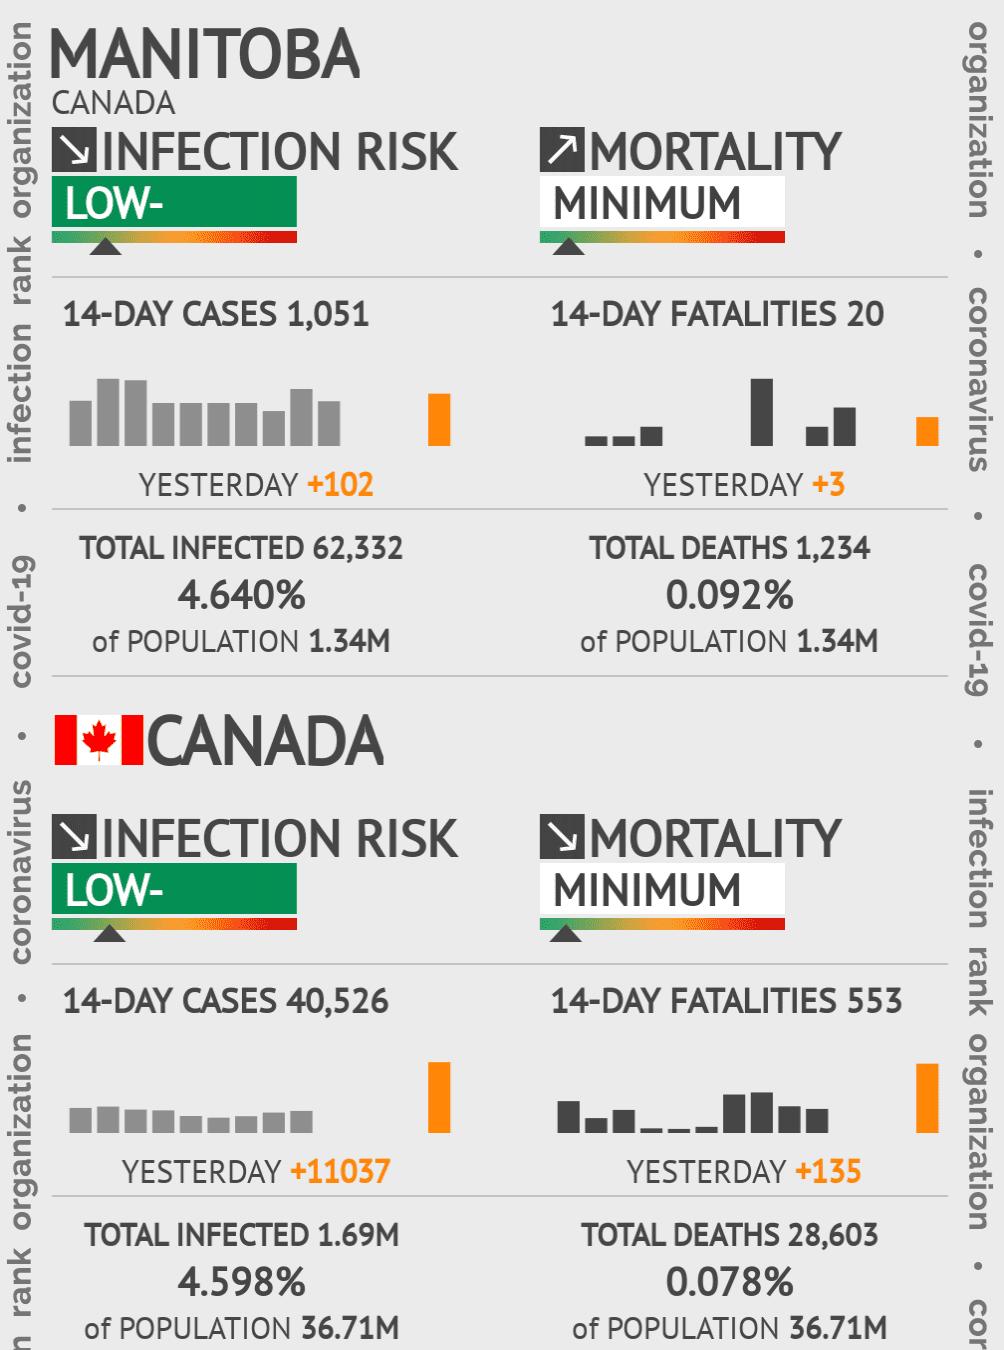 Manitoba Coronavirus Covid-19 Risk of Infection on March 02, 2021